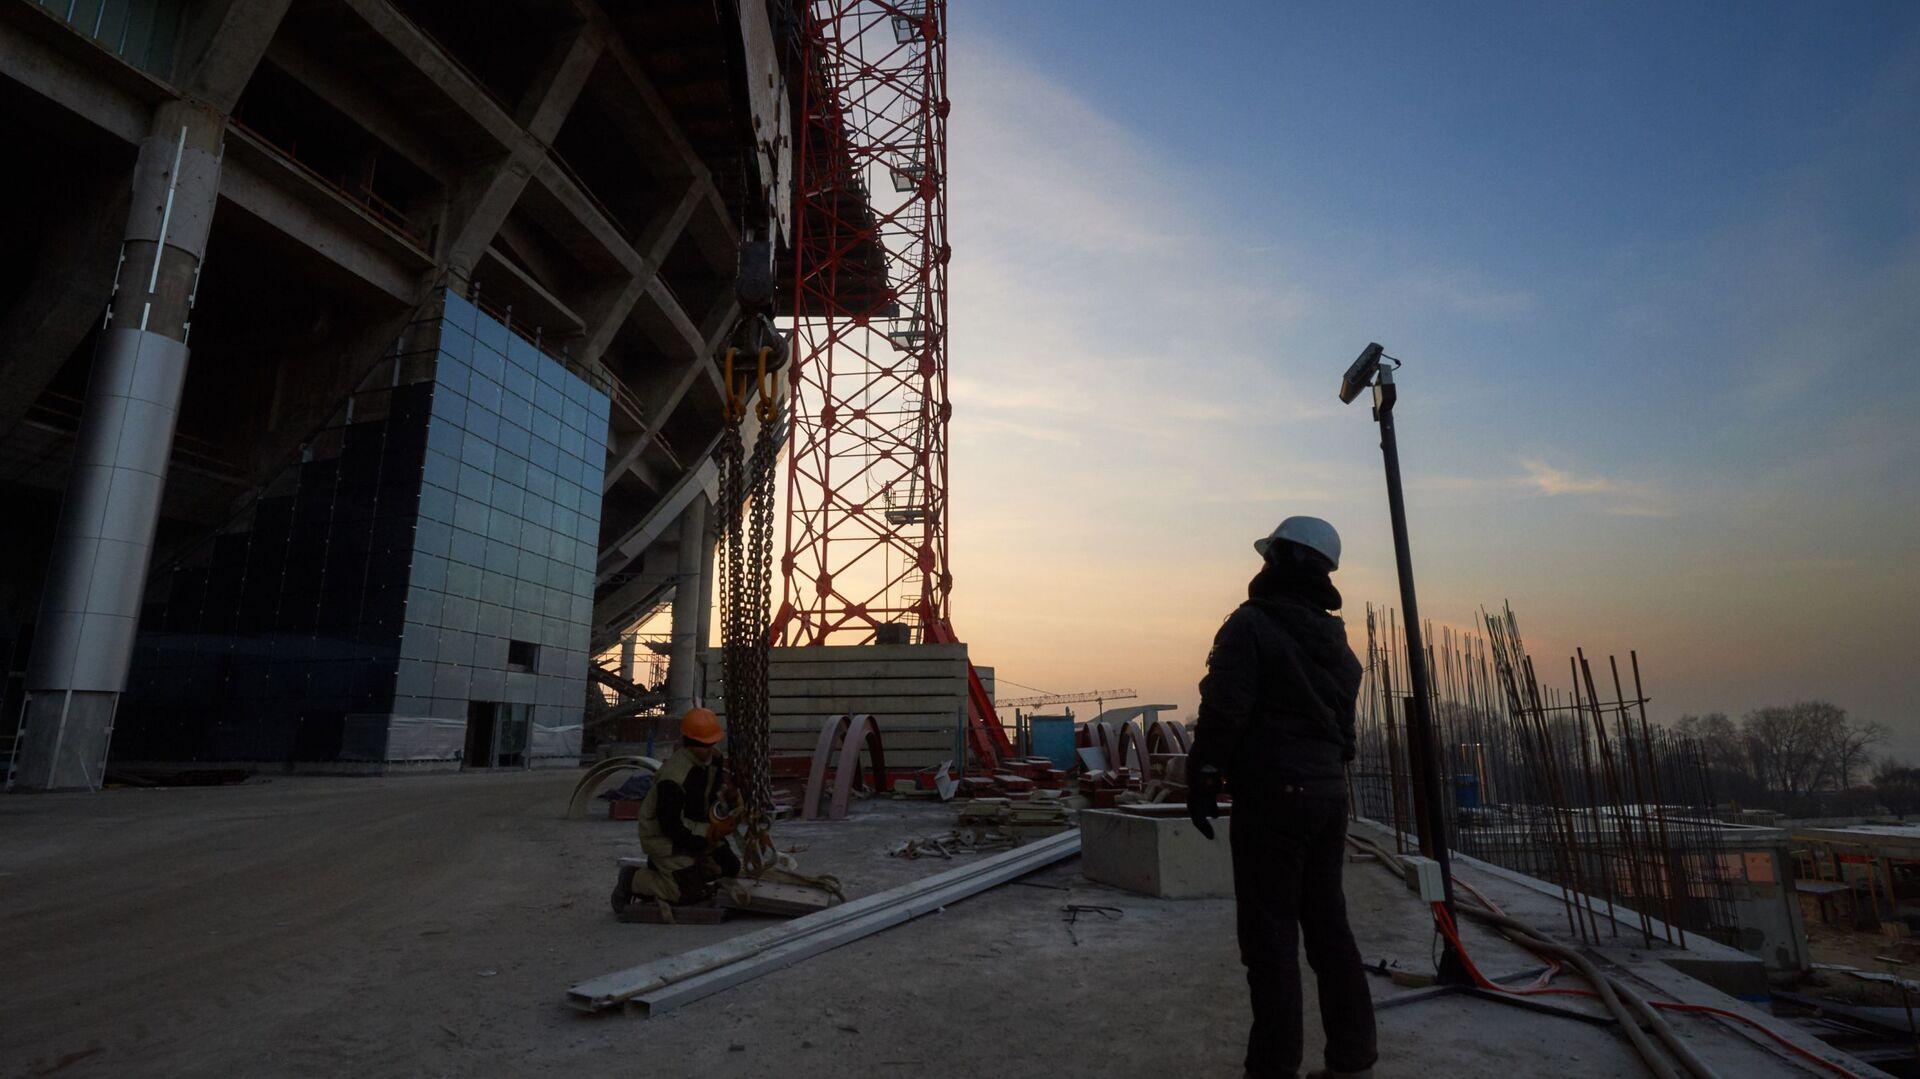 Строительство стадиона Зенит-Арена - Sputnik Таджикистан, 1920, 03.02.2021